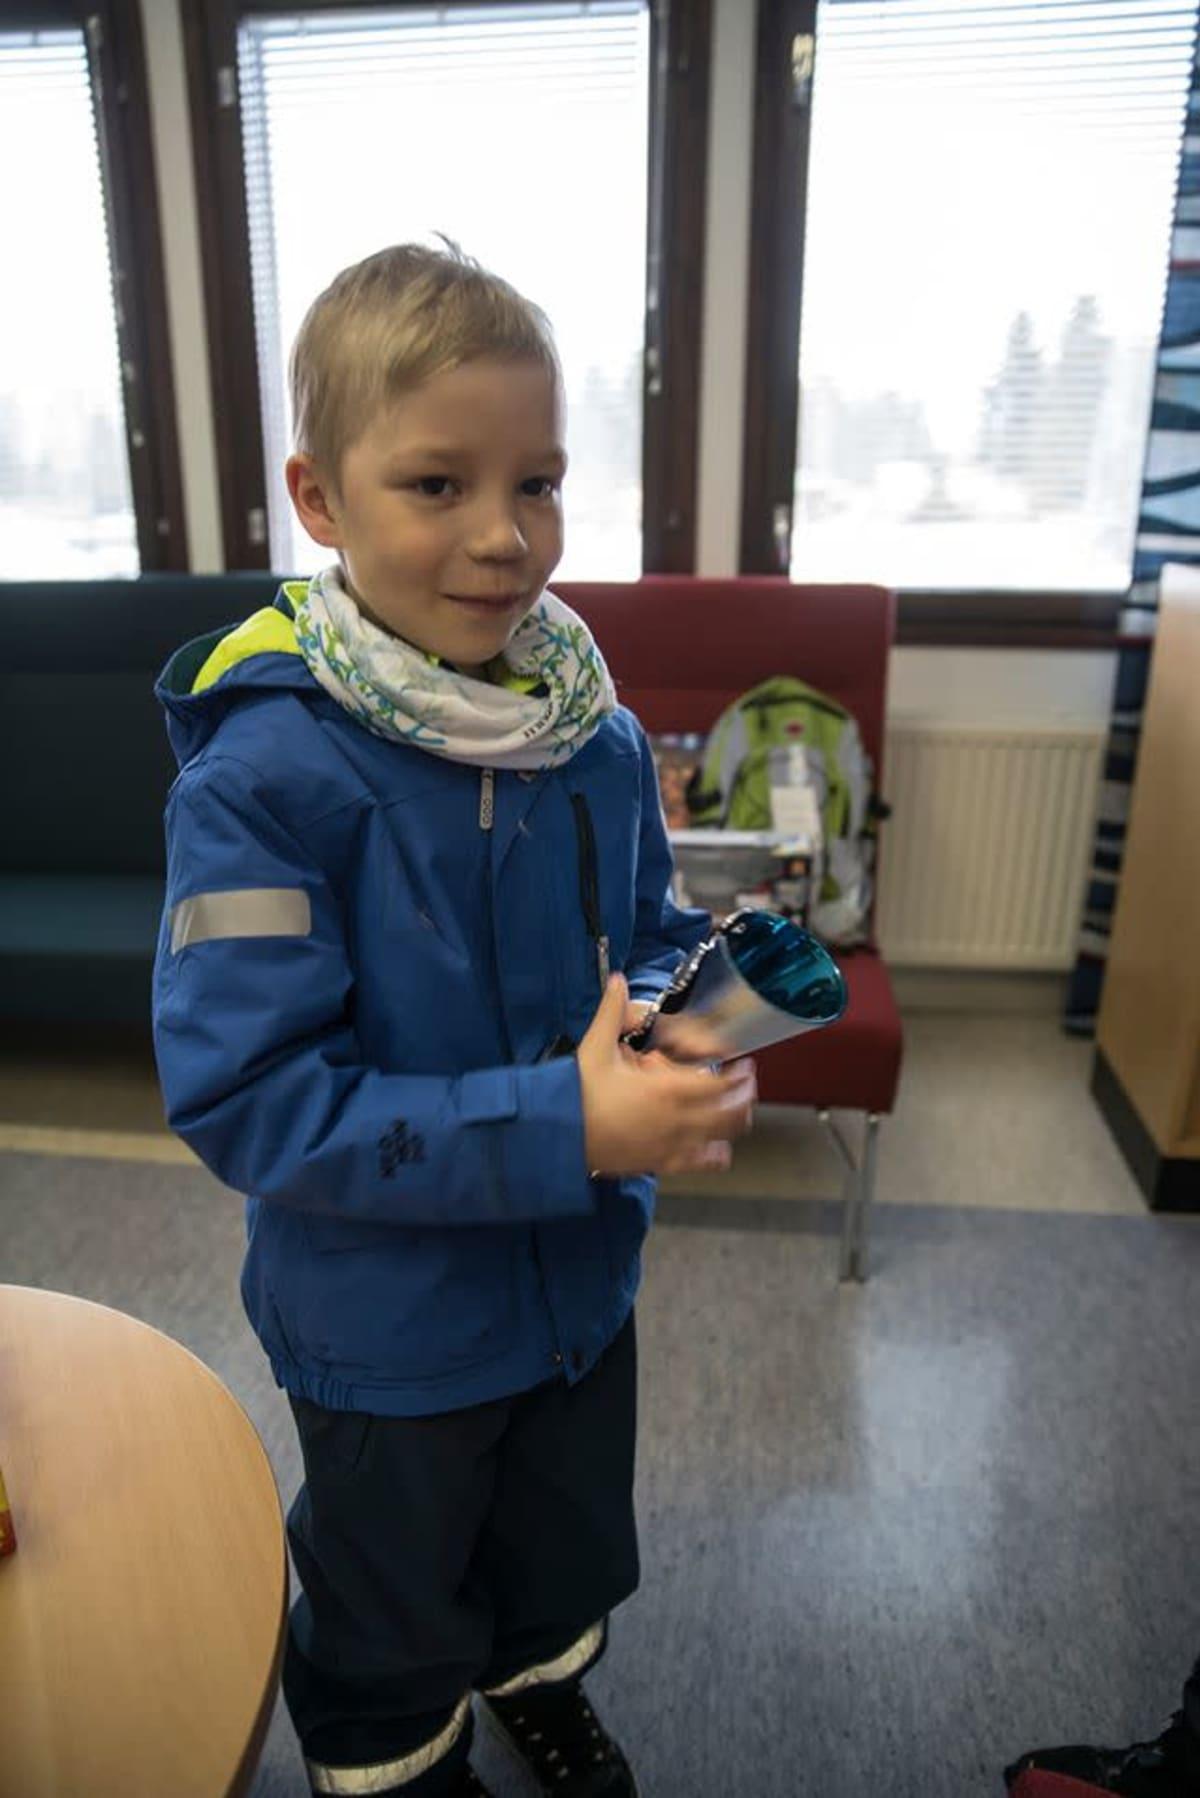 Tulipalotilanteessa ansiokkaasti toiminut Kasper Poikela ja pokaali